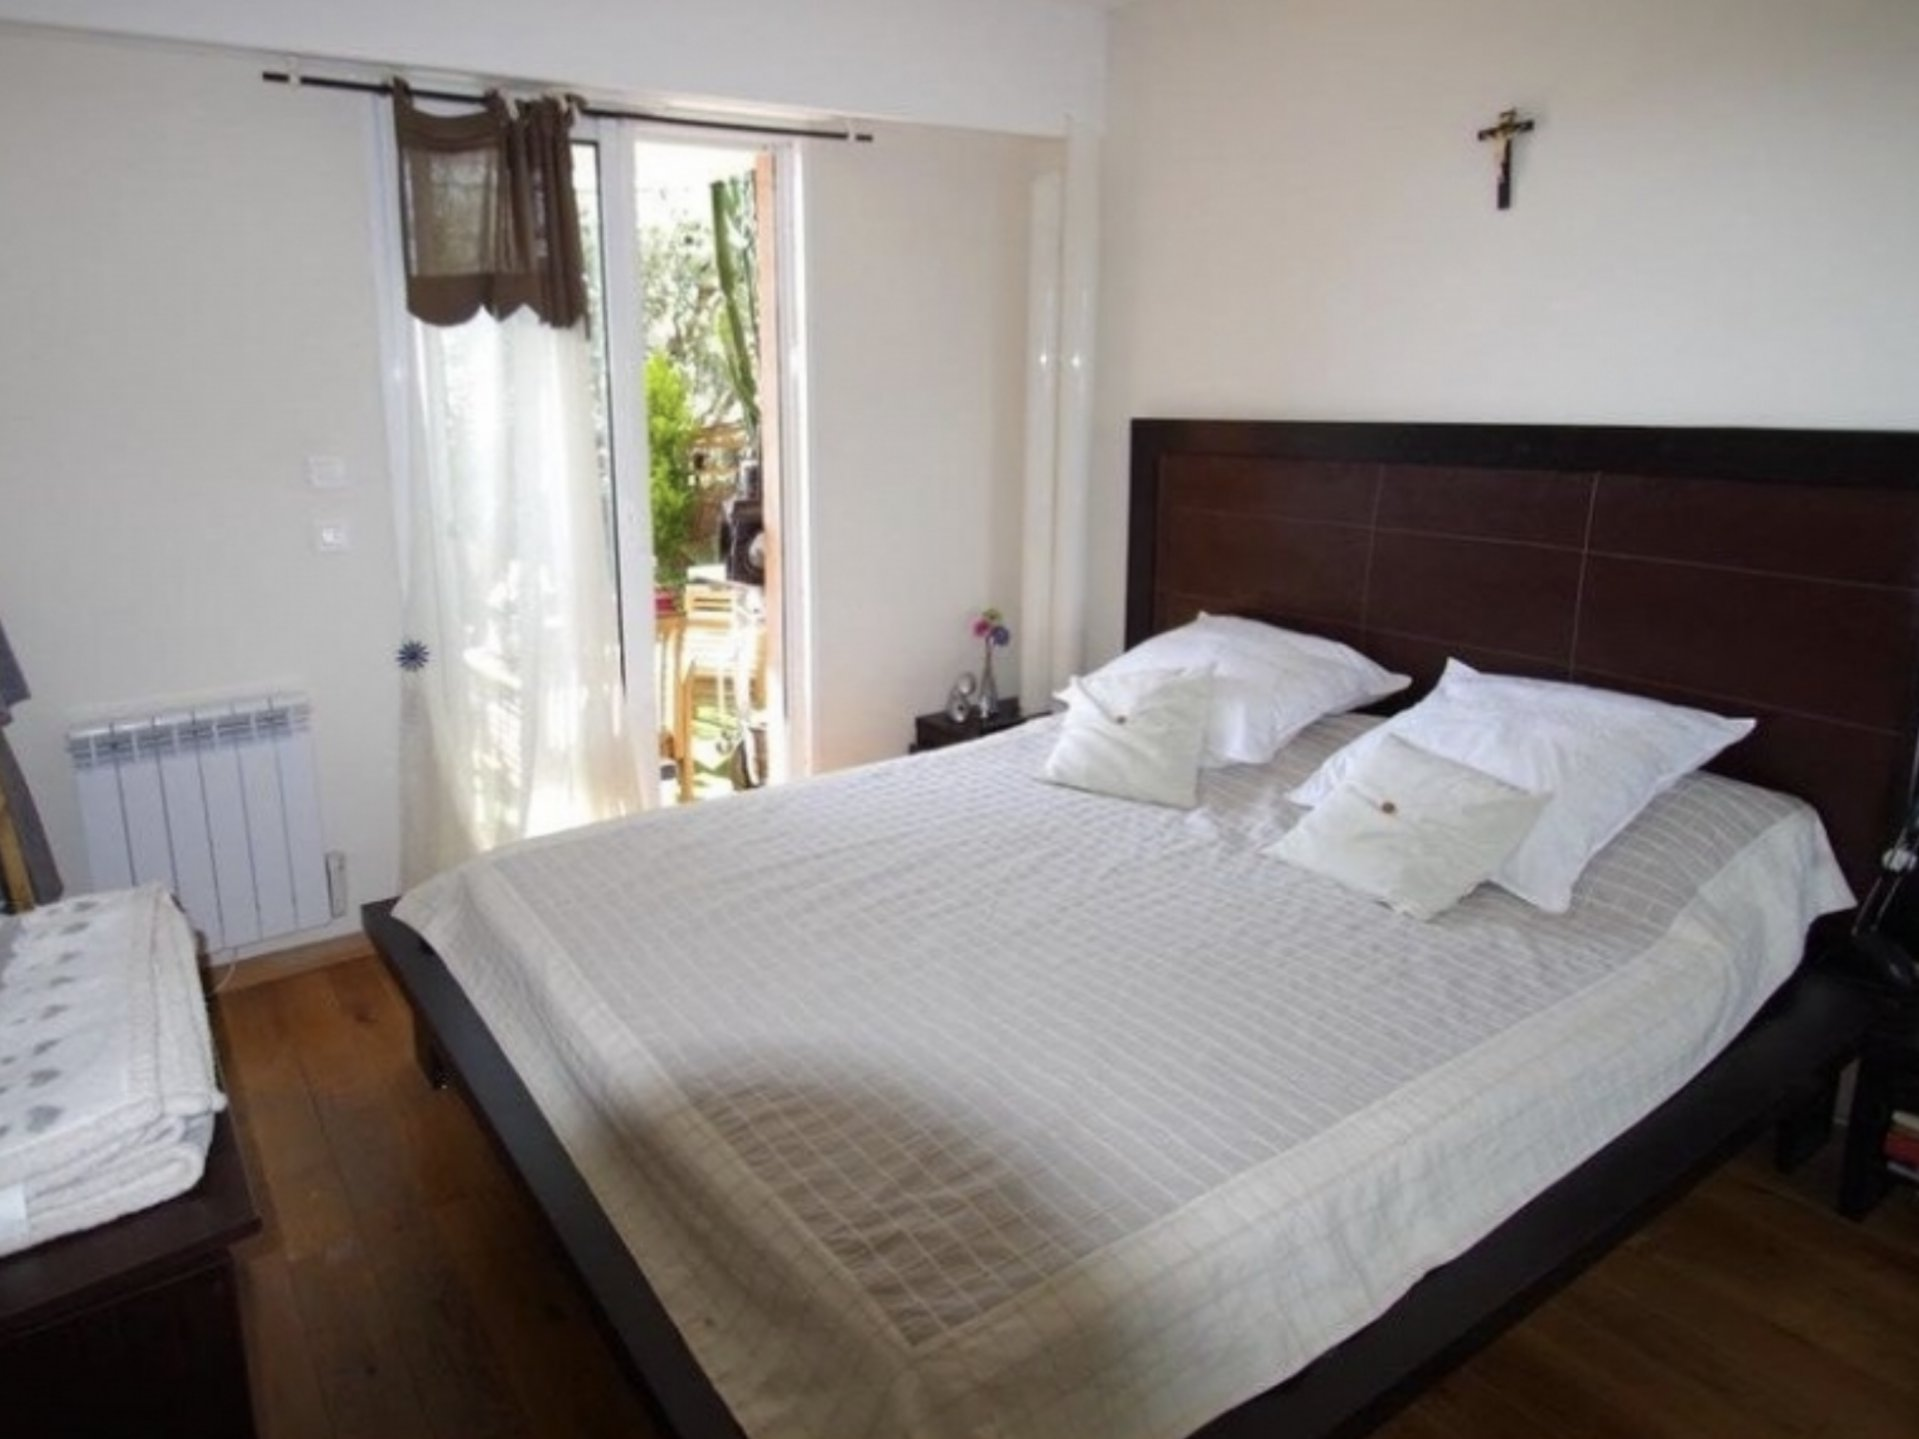 Продажа Апартаменты - Вильфранш-сюр-Мер (Villefranche-sur-Mer) VINAIGRIER